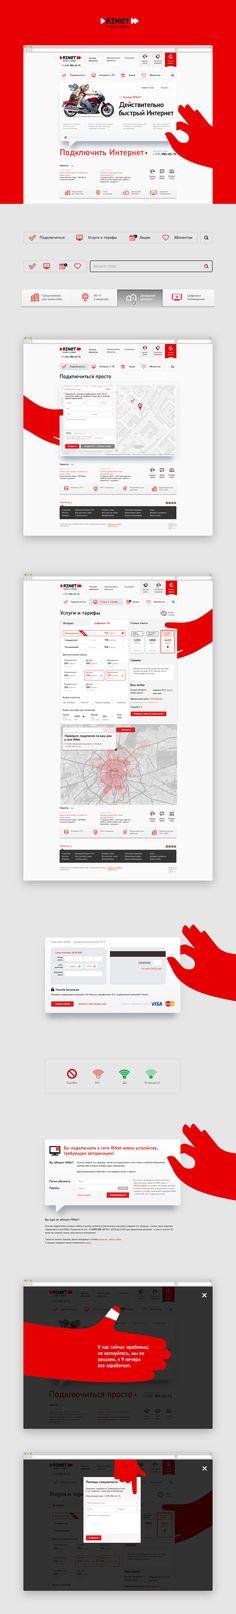 RiNet — интернет-провайдер Москвы Сайт © Назир Хасавов #website #webdesign